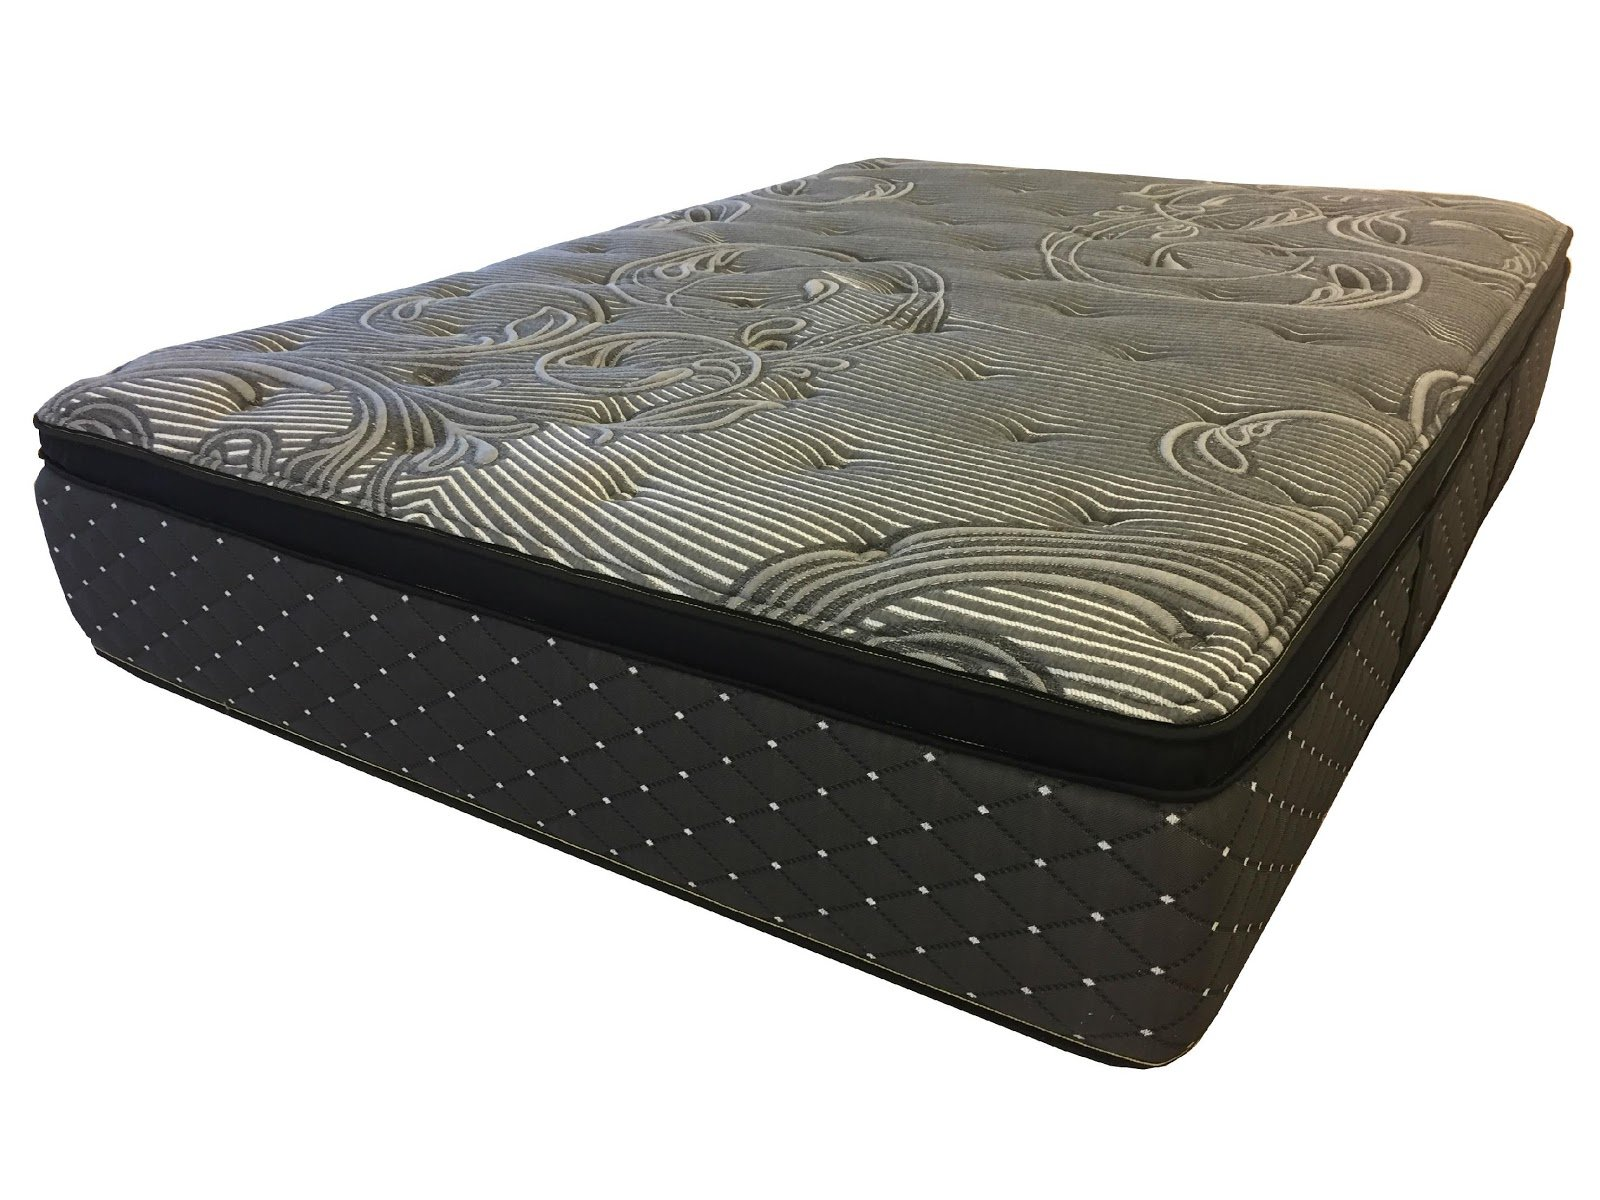 9000 Luxury Plush Pillowtop